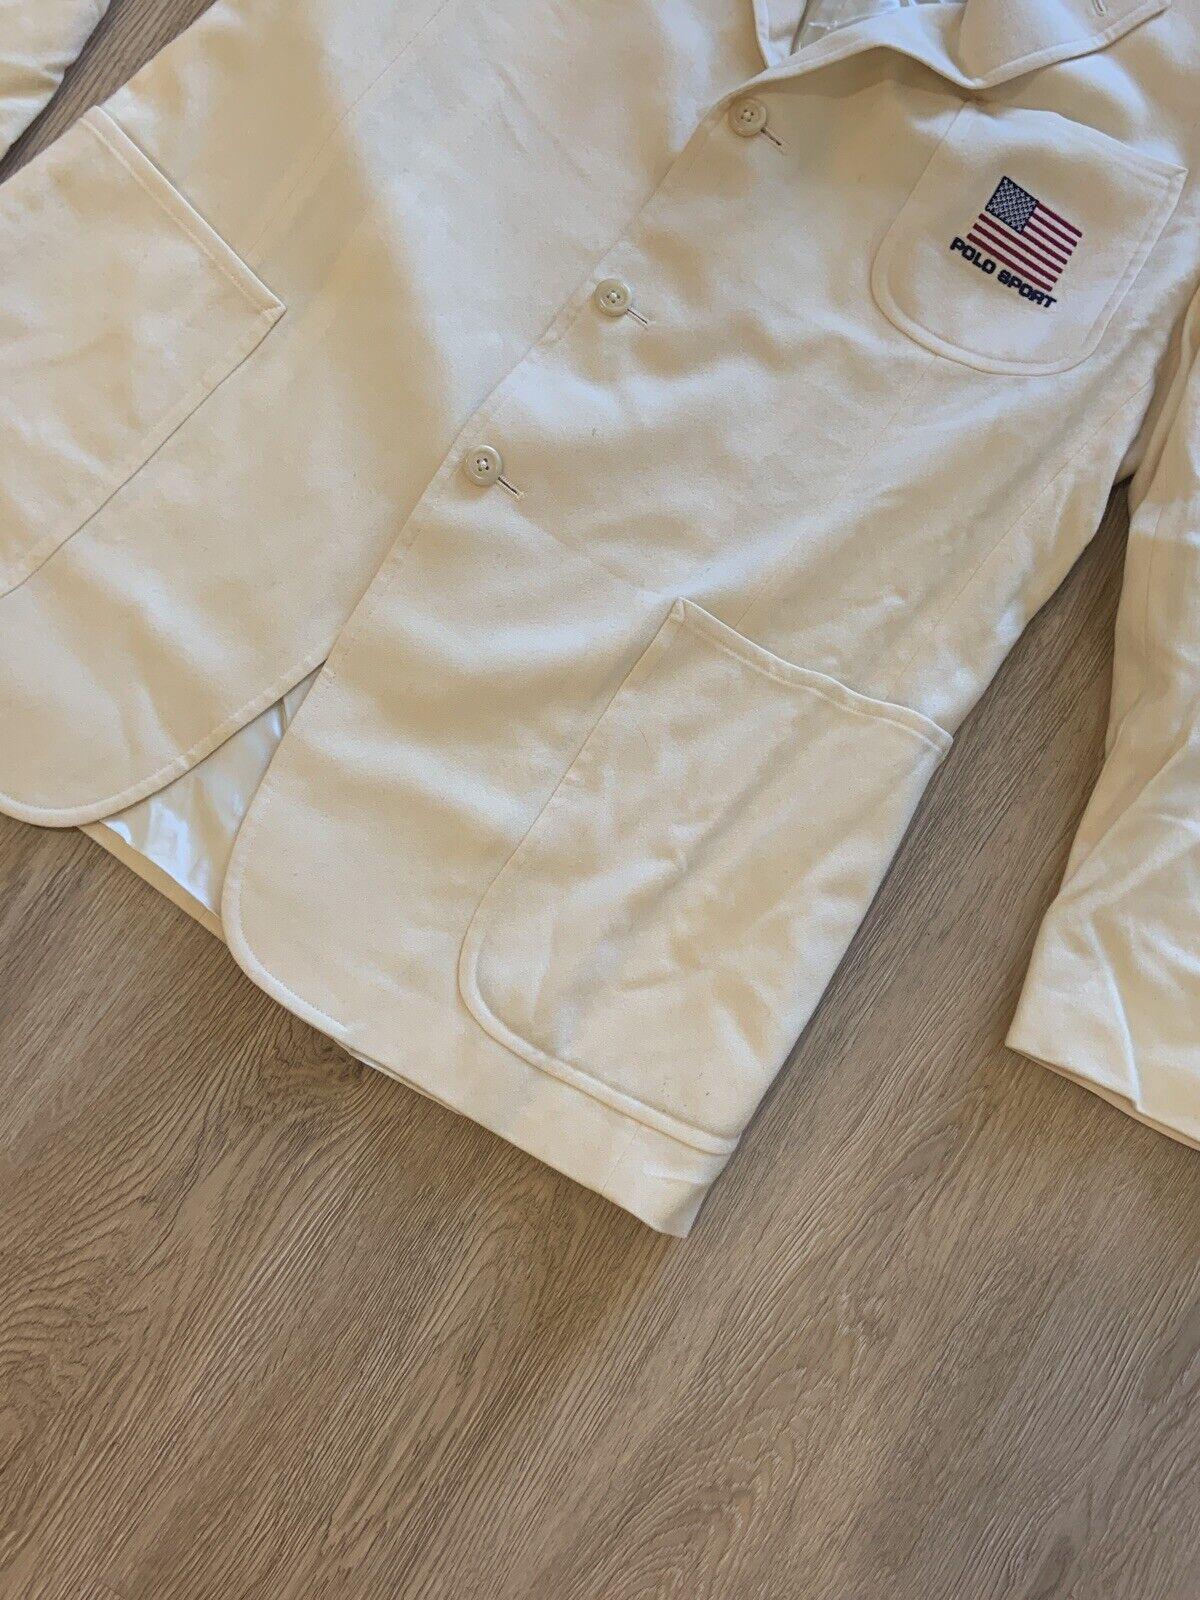 Vintage Polo Sport Sport Jacket - image 4